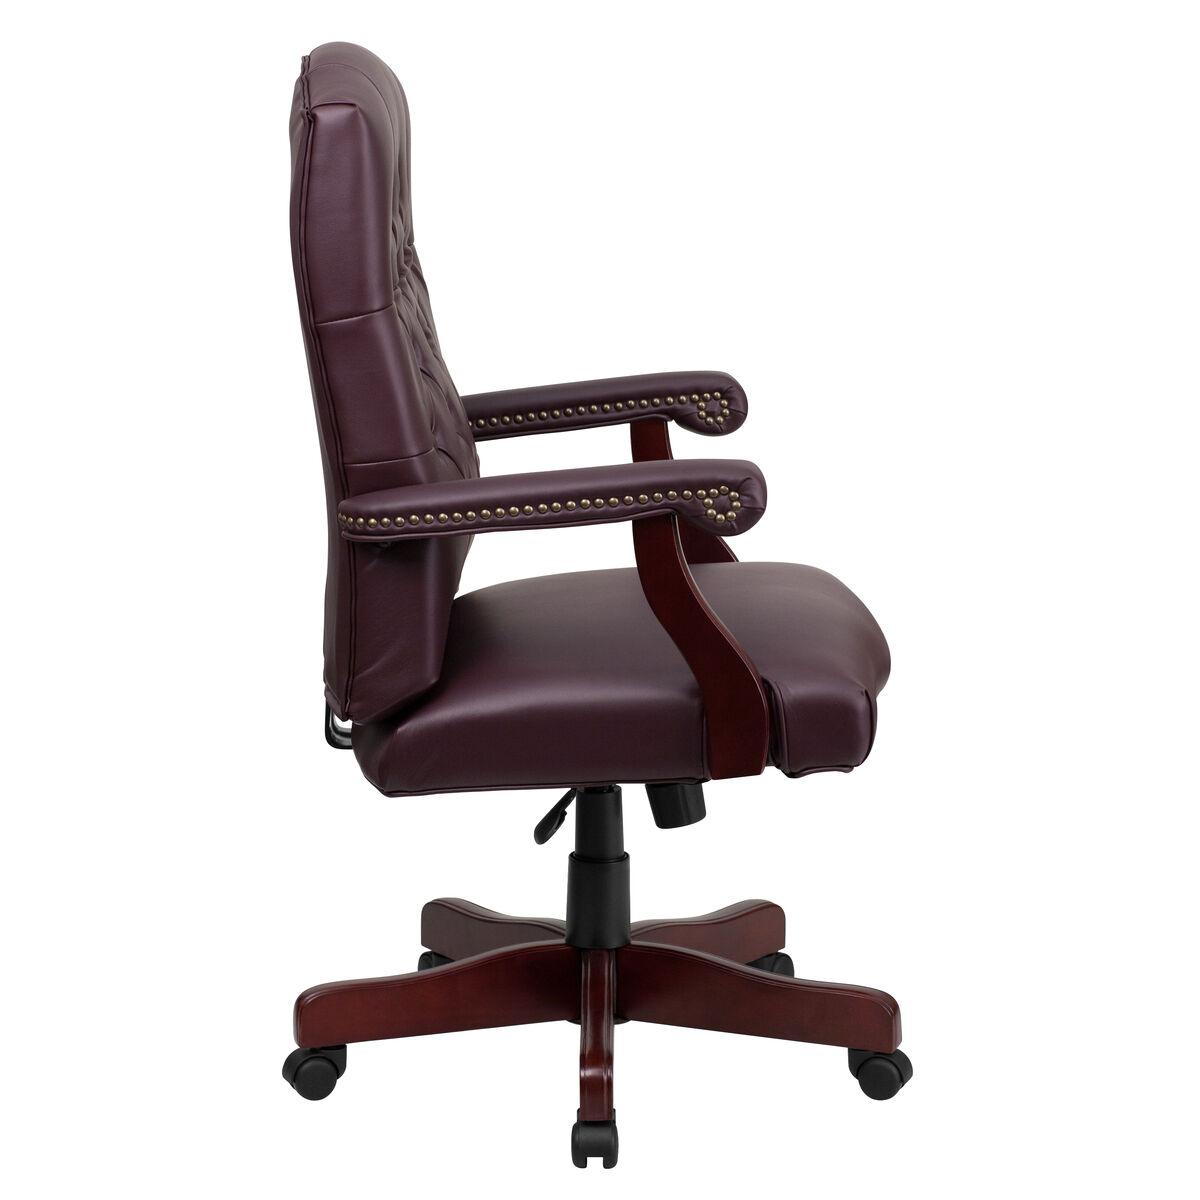 burgundy high back chair 801l lf0019 by lea gg churchchairs4less com